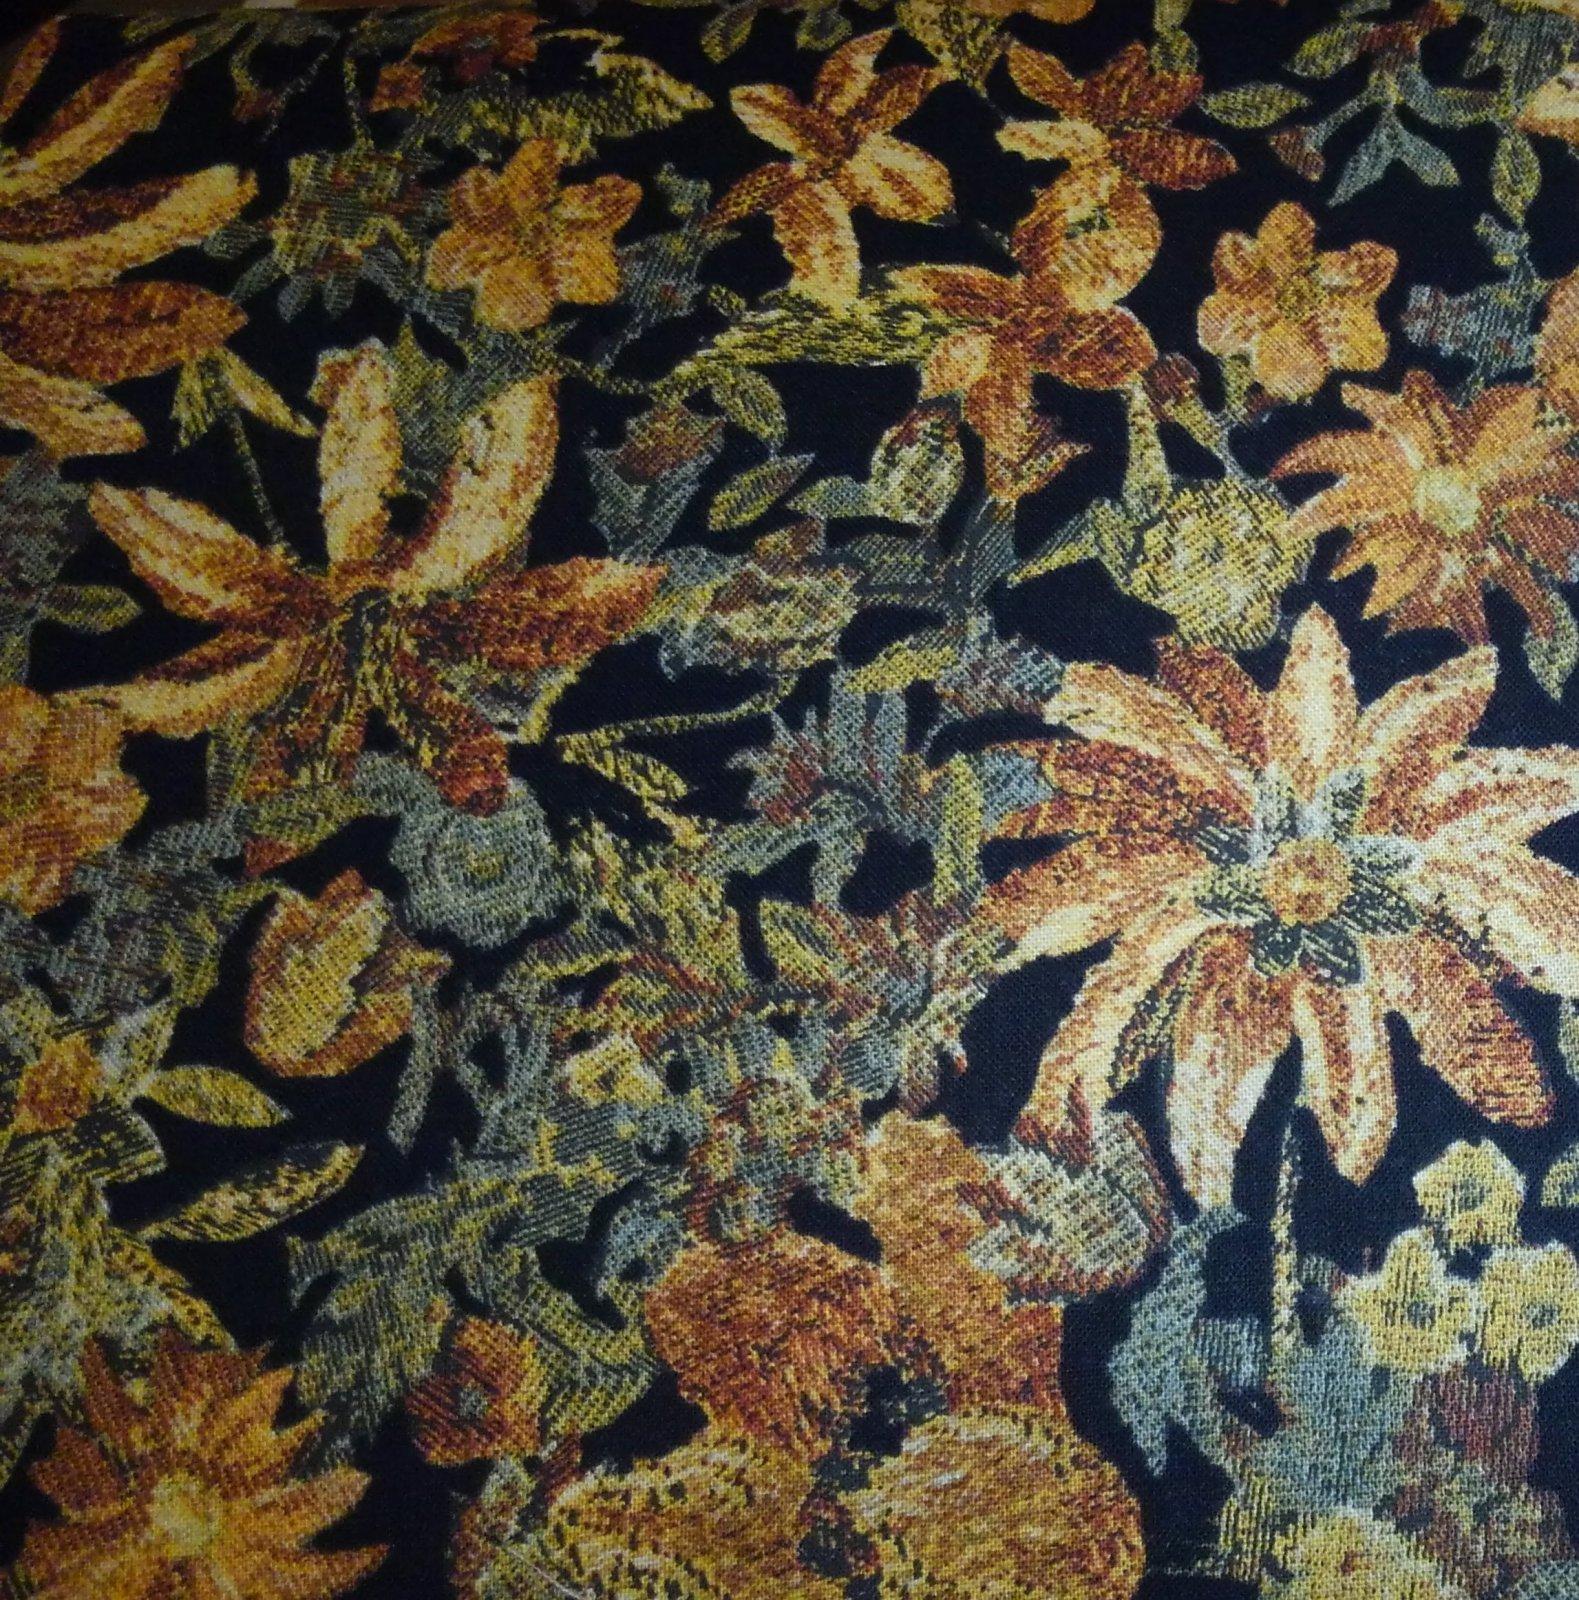 Delhi 2450-002 Flower, Rust, Sage, Black Multi Color Fabric